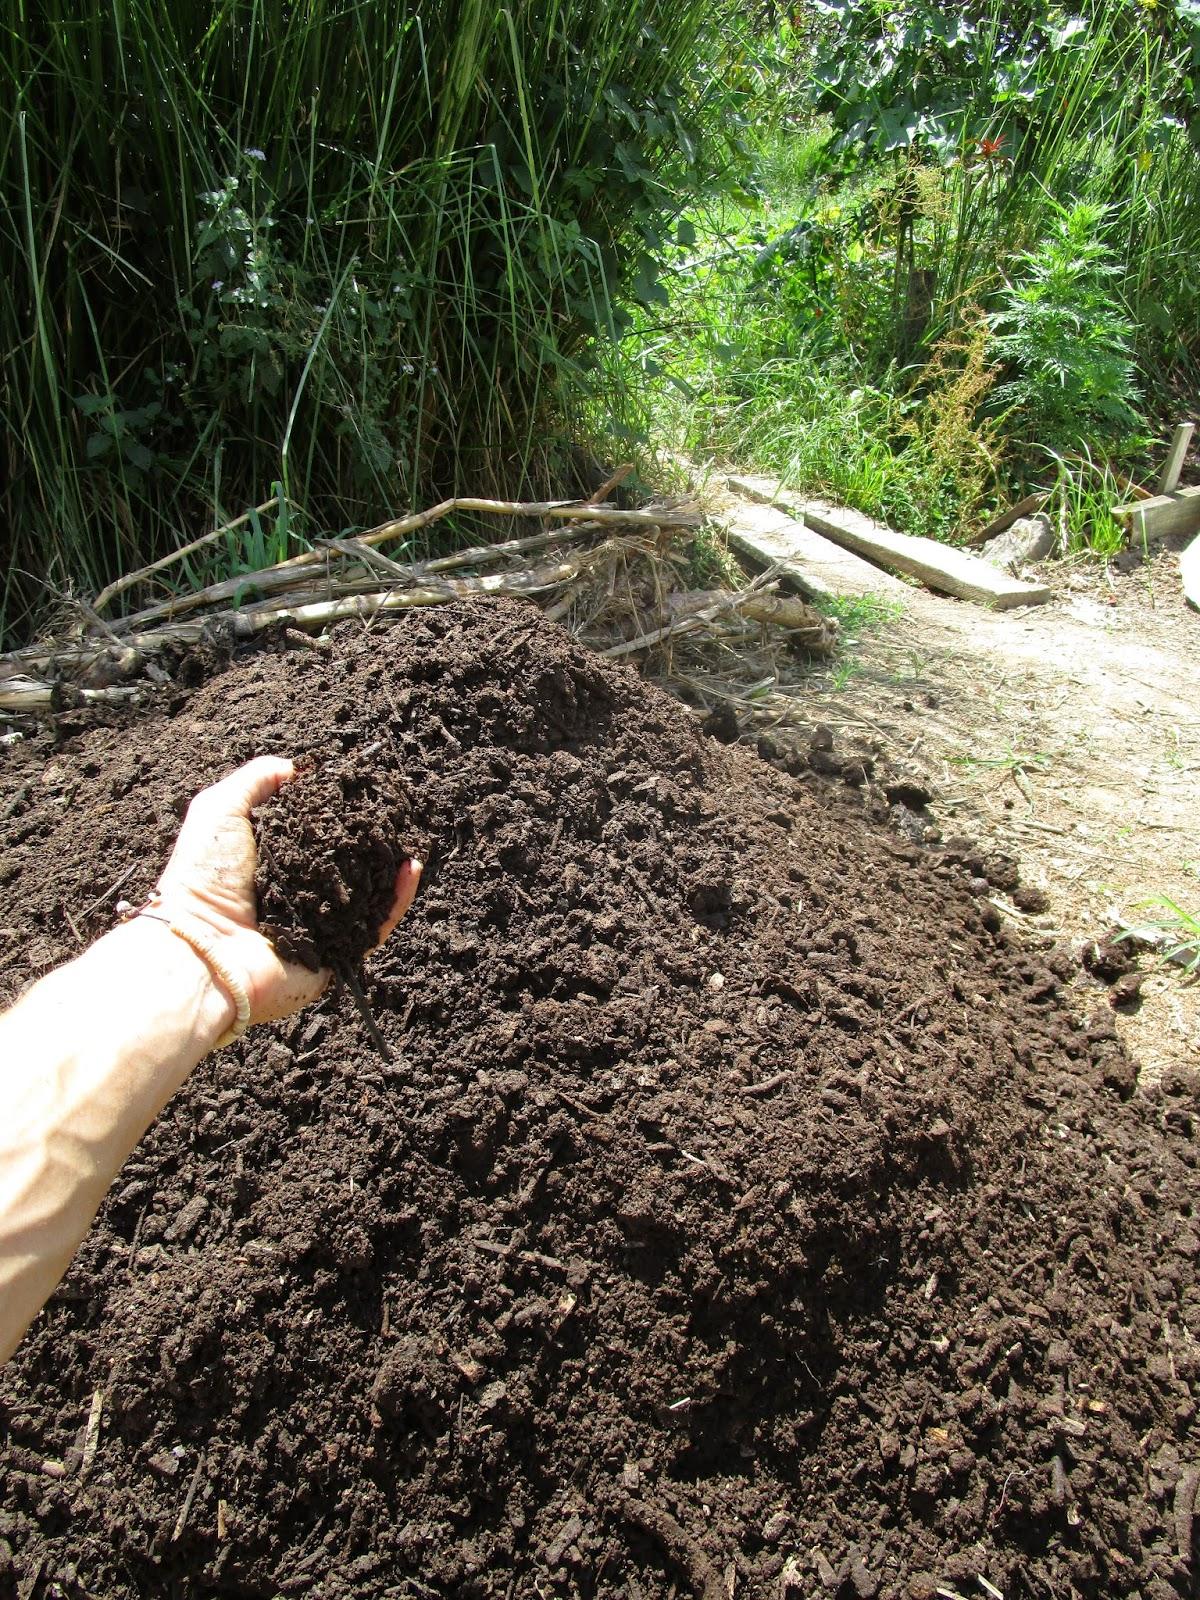 Biogas sludge turns into rich soil at PRI Sunshine Coast